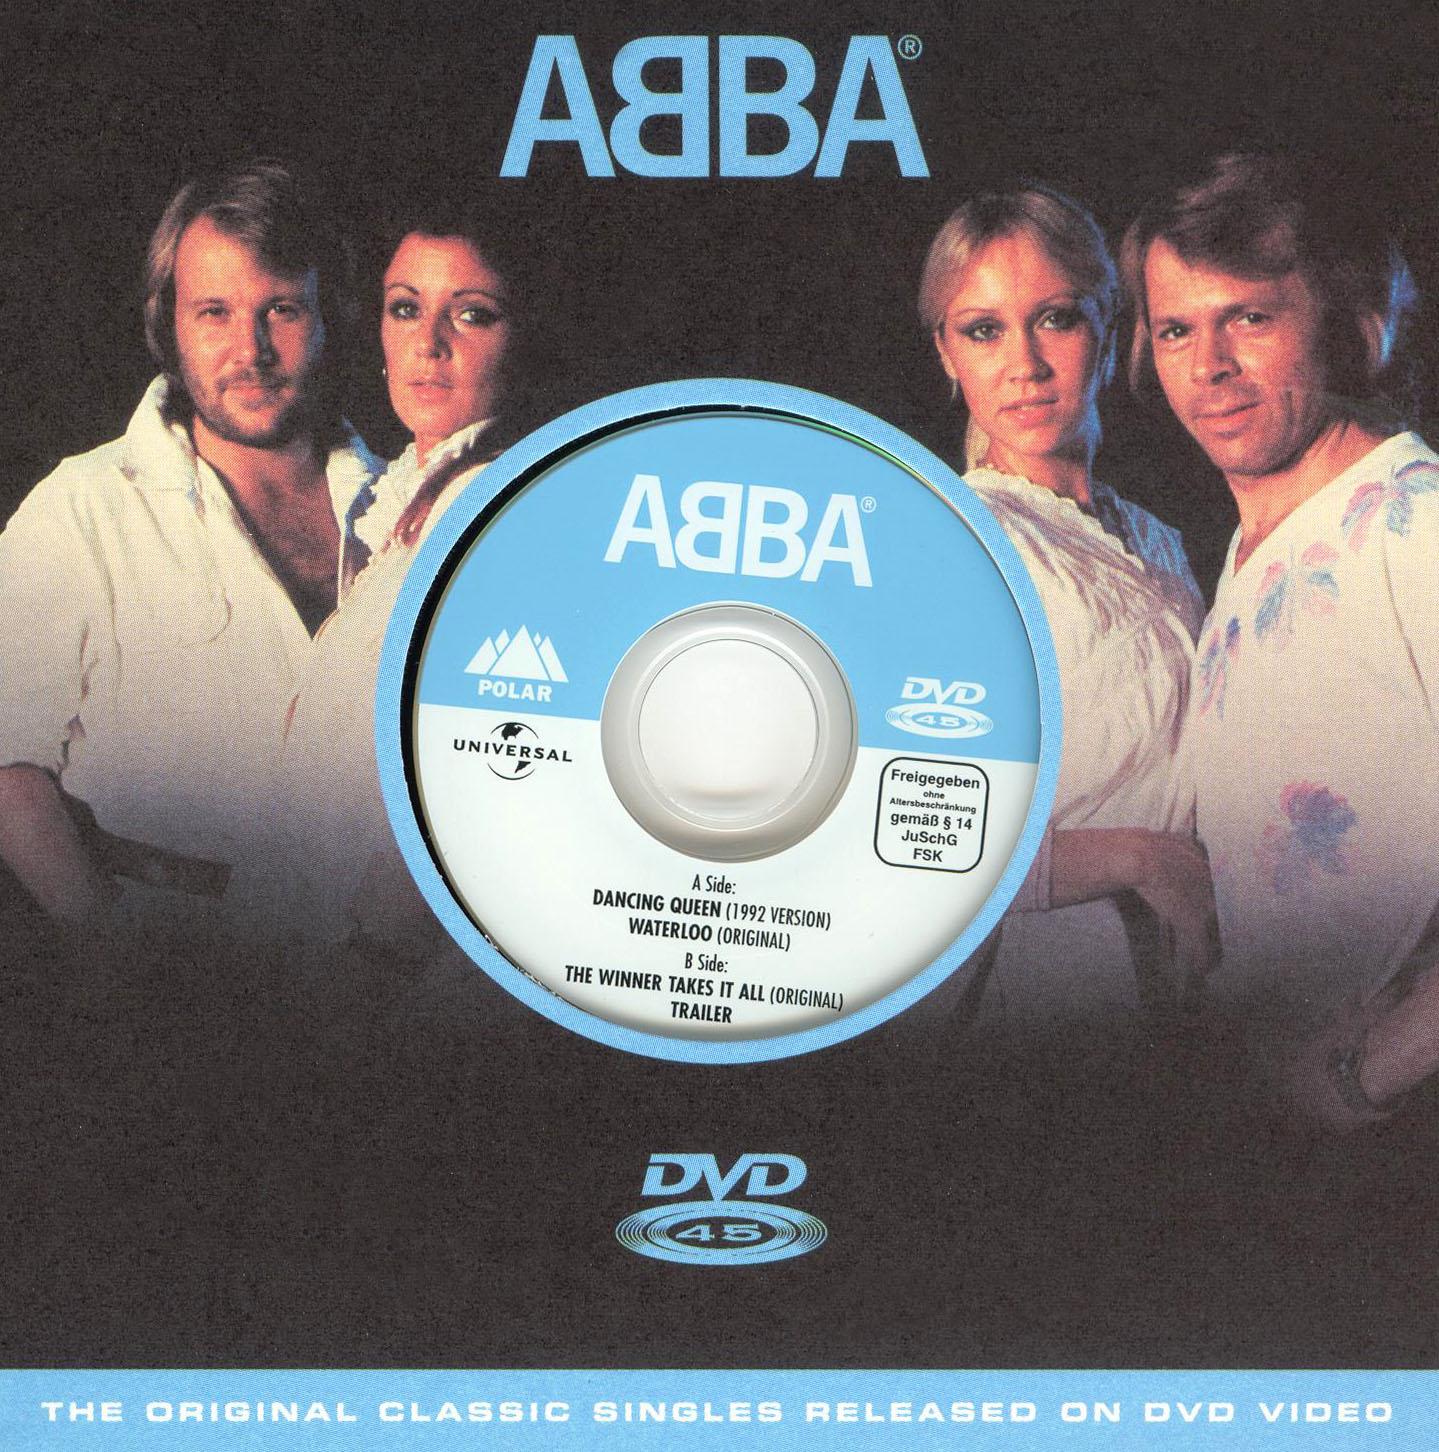 ABBA: Waterloo